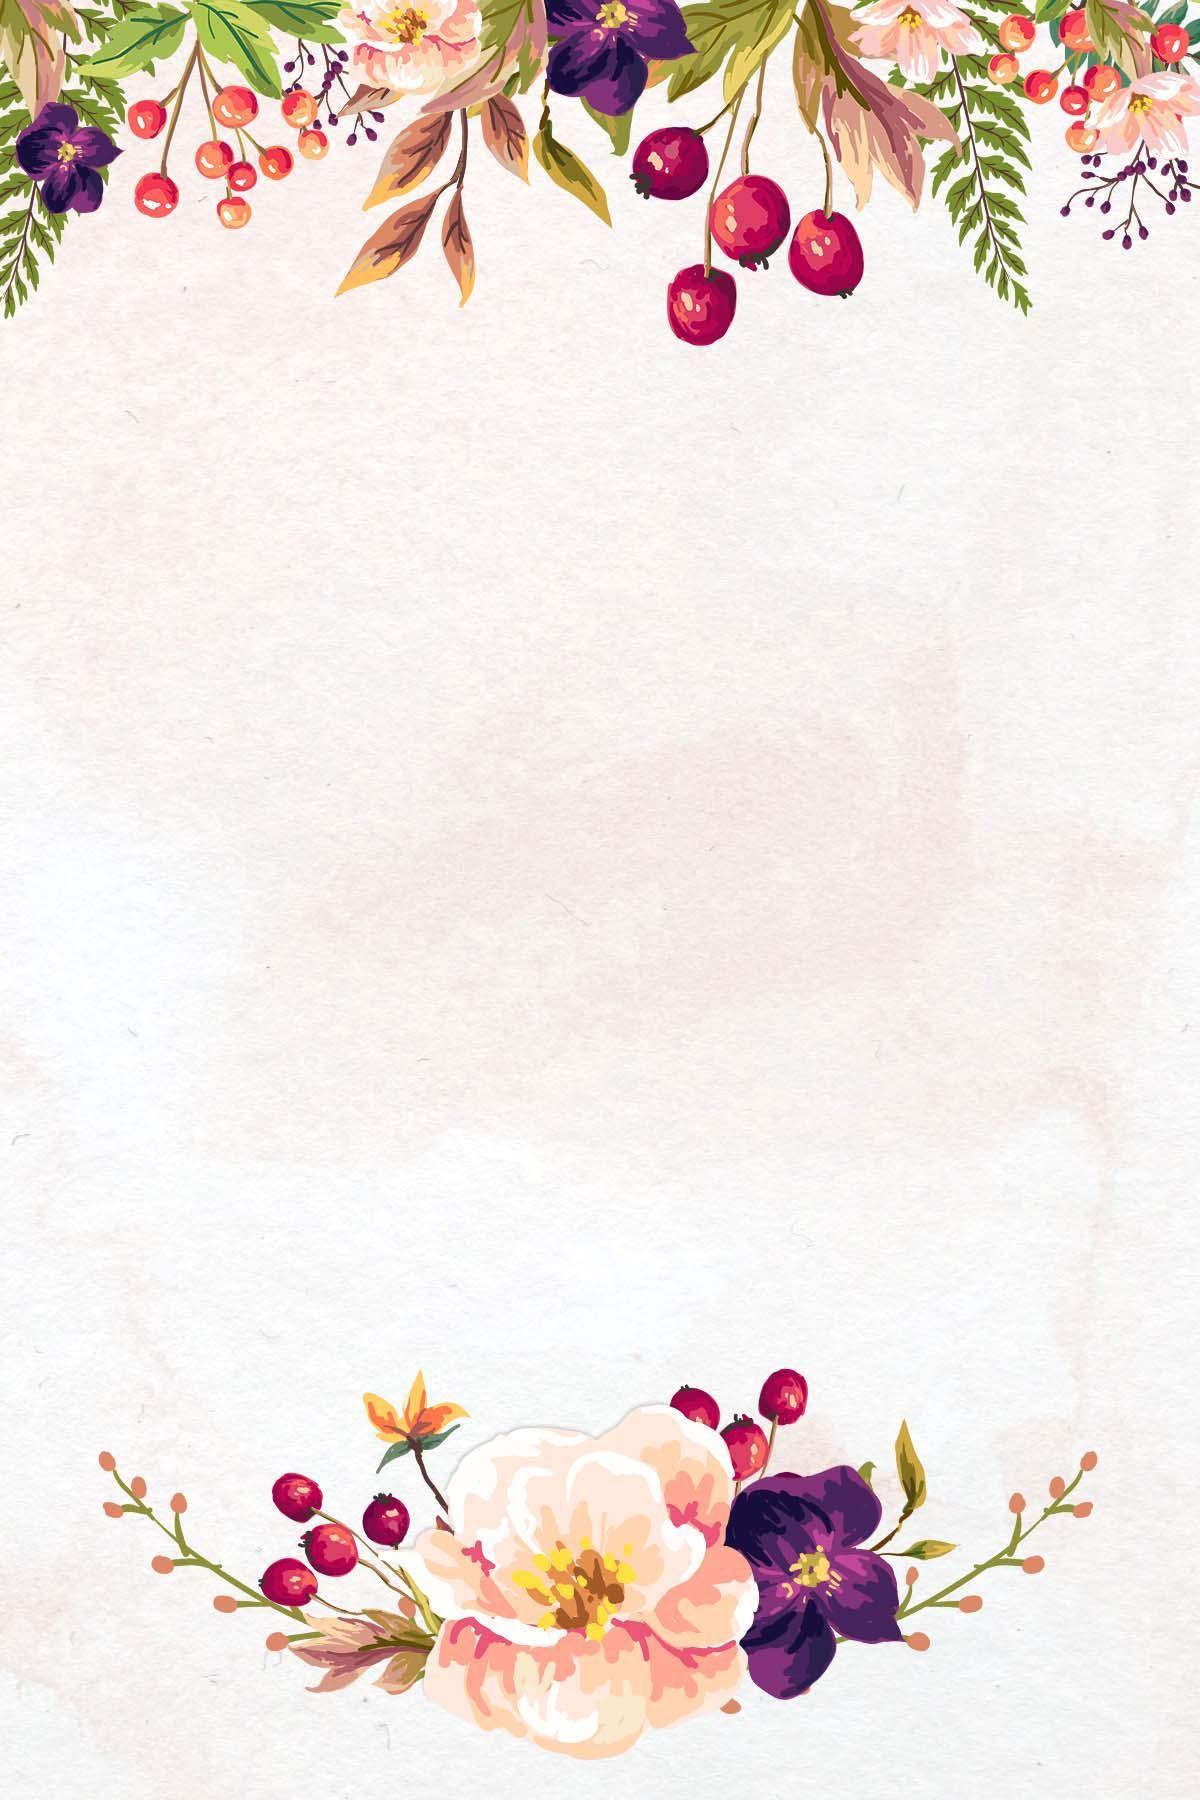 13 Inspiring Blank Wedding Invitation Card Designs Images Blank Wedding Invitations Blank Wedding Invitation Templates Wedding Invitation Card Design